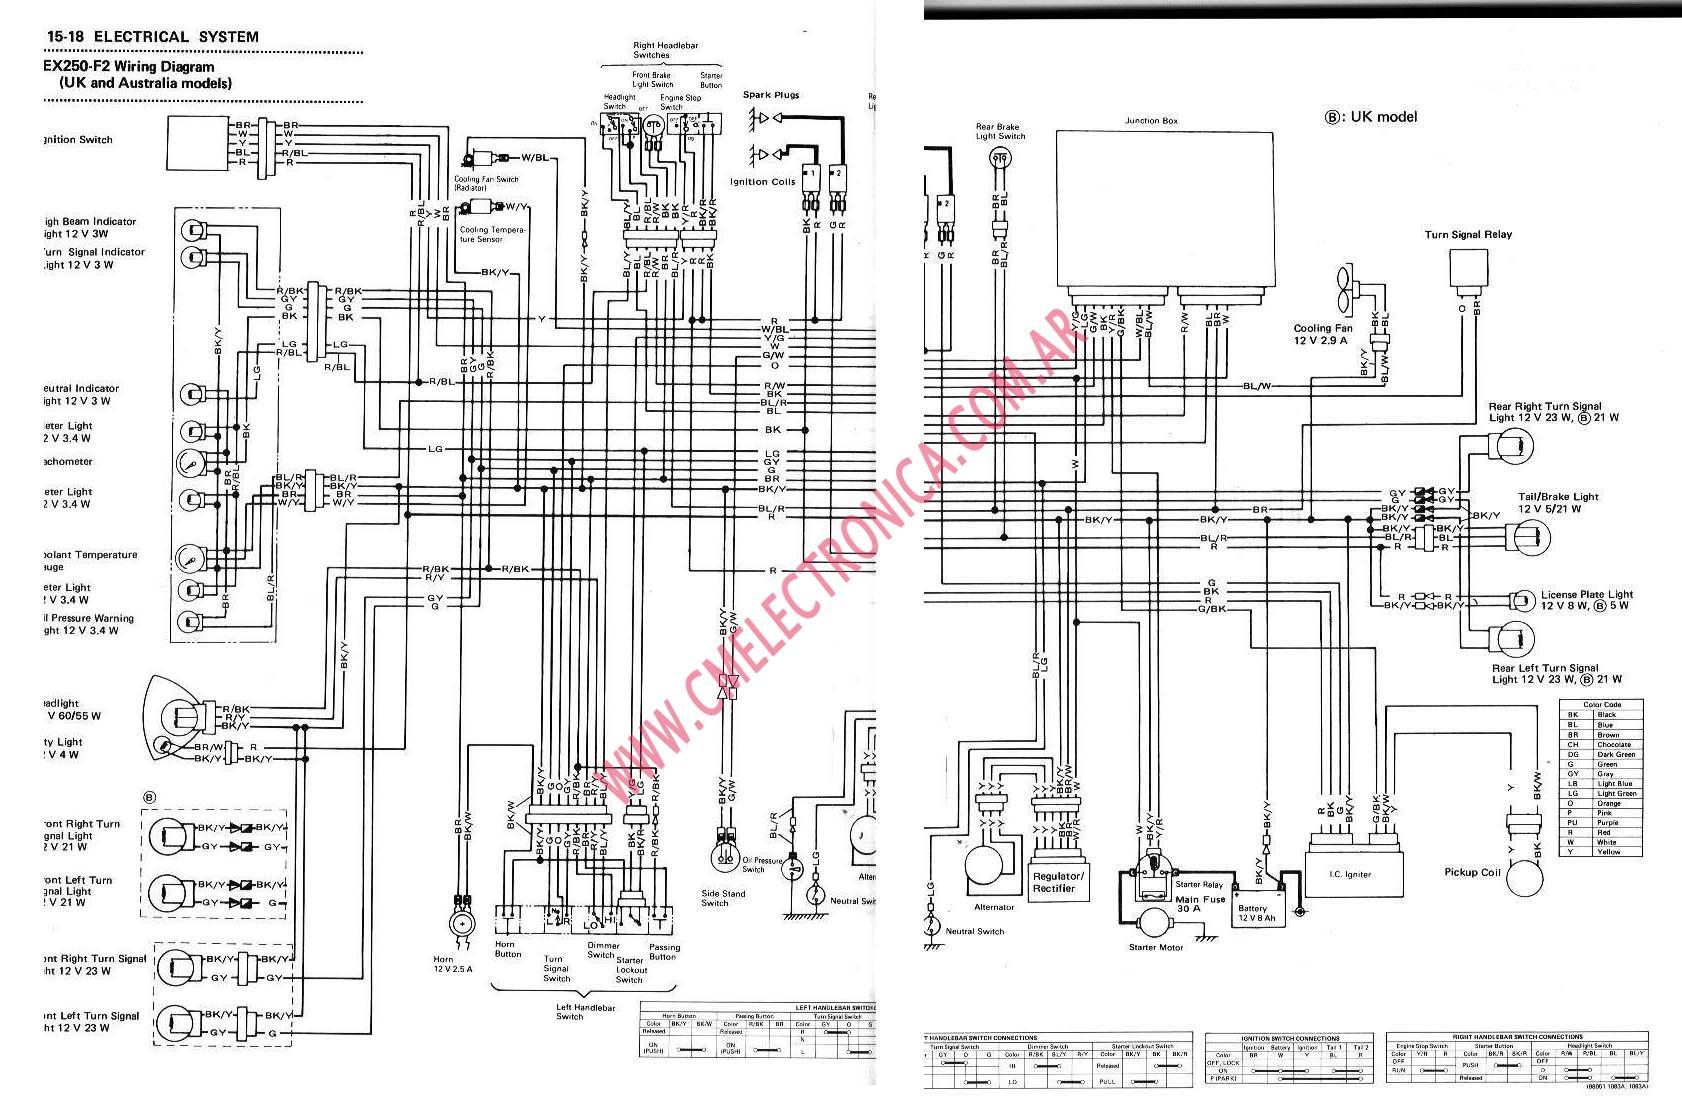 kawasaki gpx250?resize\\\\\\\\\\\\\\\=665%2C440 bajaj wind 125 wiring diagram wiring diagram simonand  at alyssarenee.co